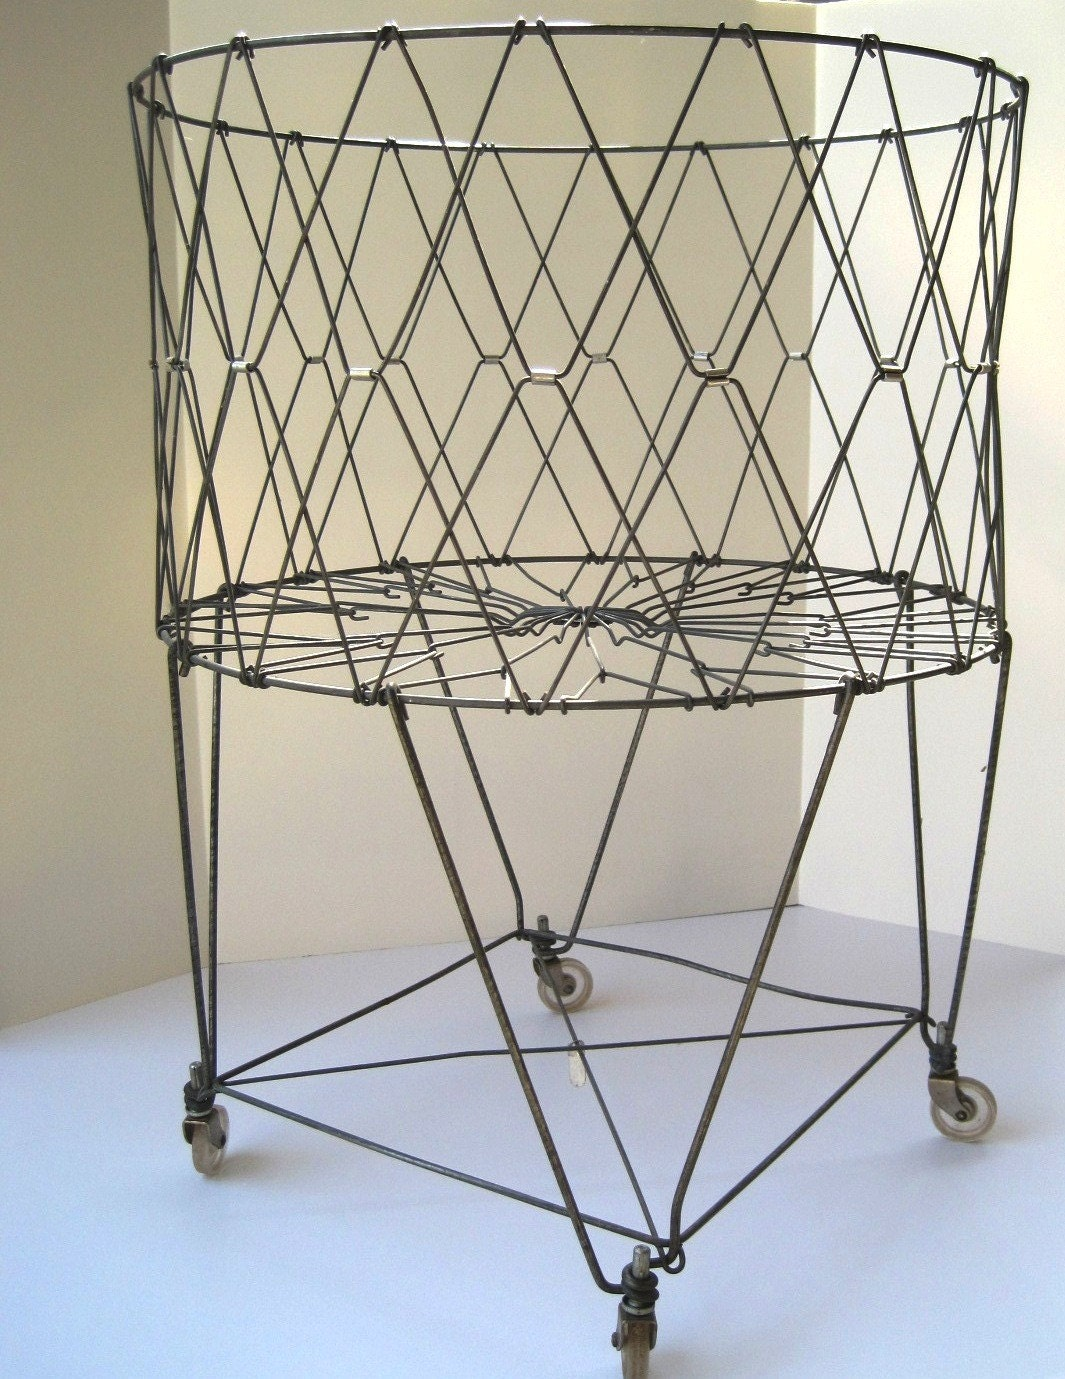 Vintage Metal Folding Table picture on vintage laundry metal folding basket on with Vintage Metal Folding Table, Folding Table 3e1ac440e1d21116170f1971bfef94cc